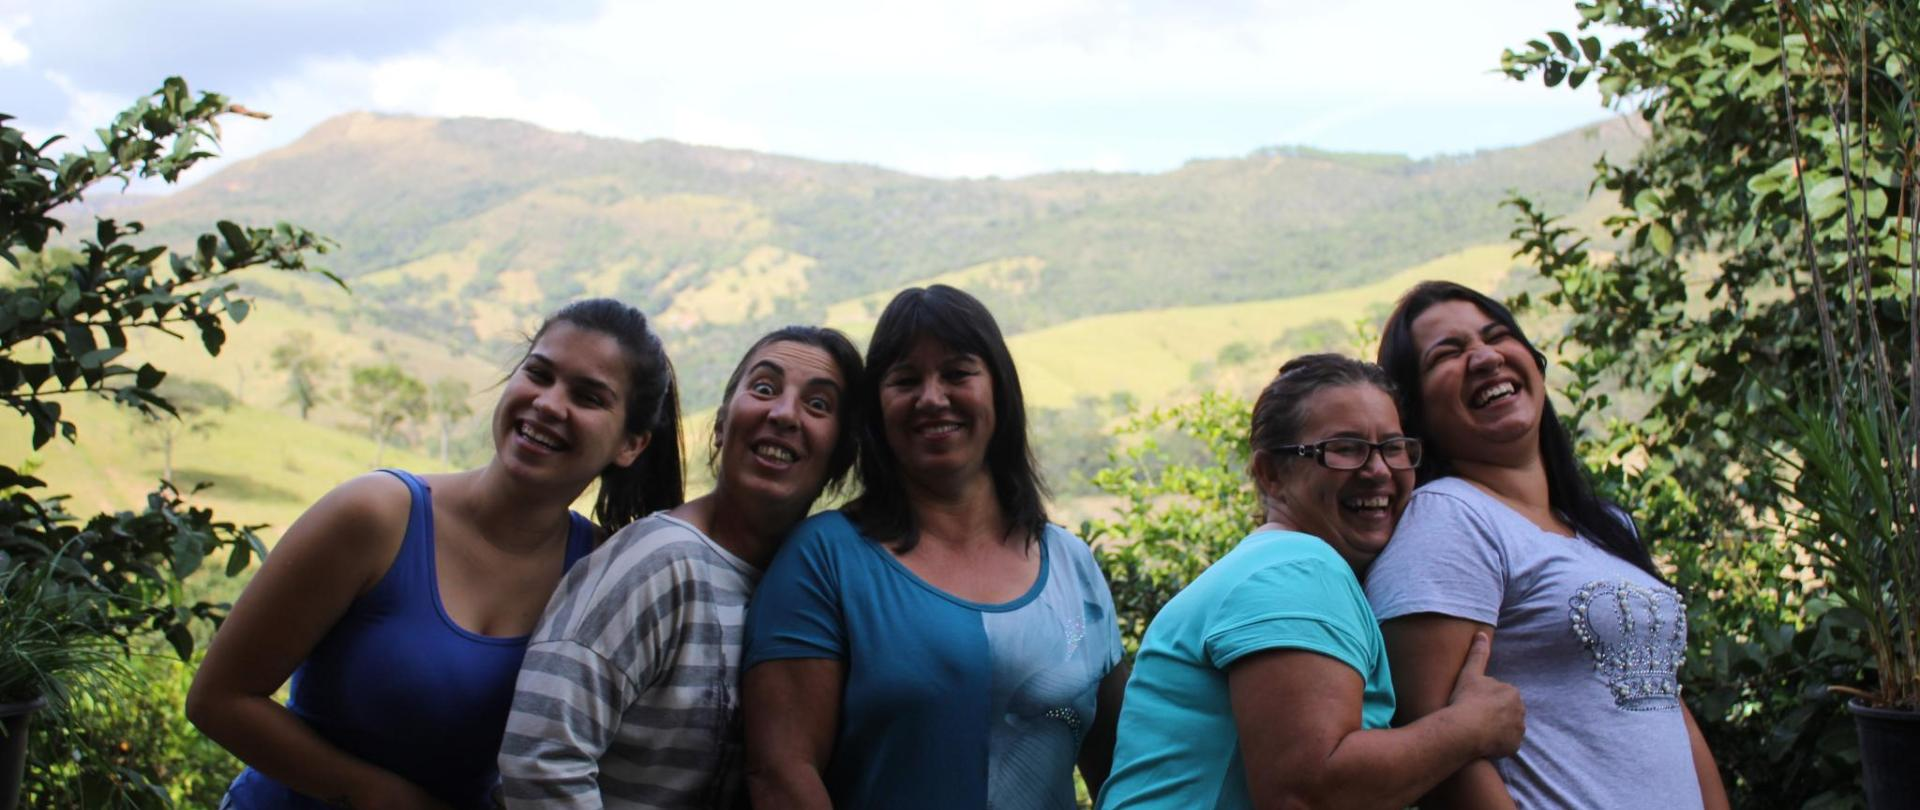 Dia das Maes Zueira.jpg